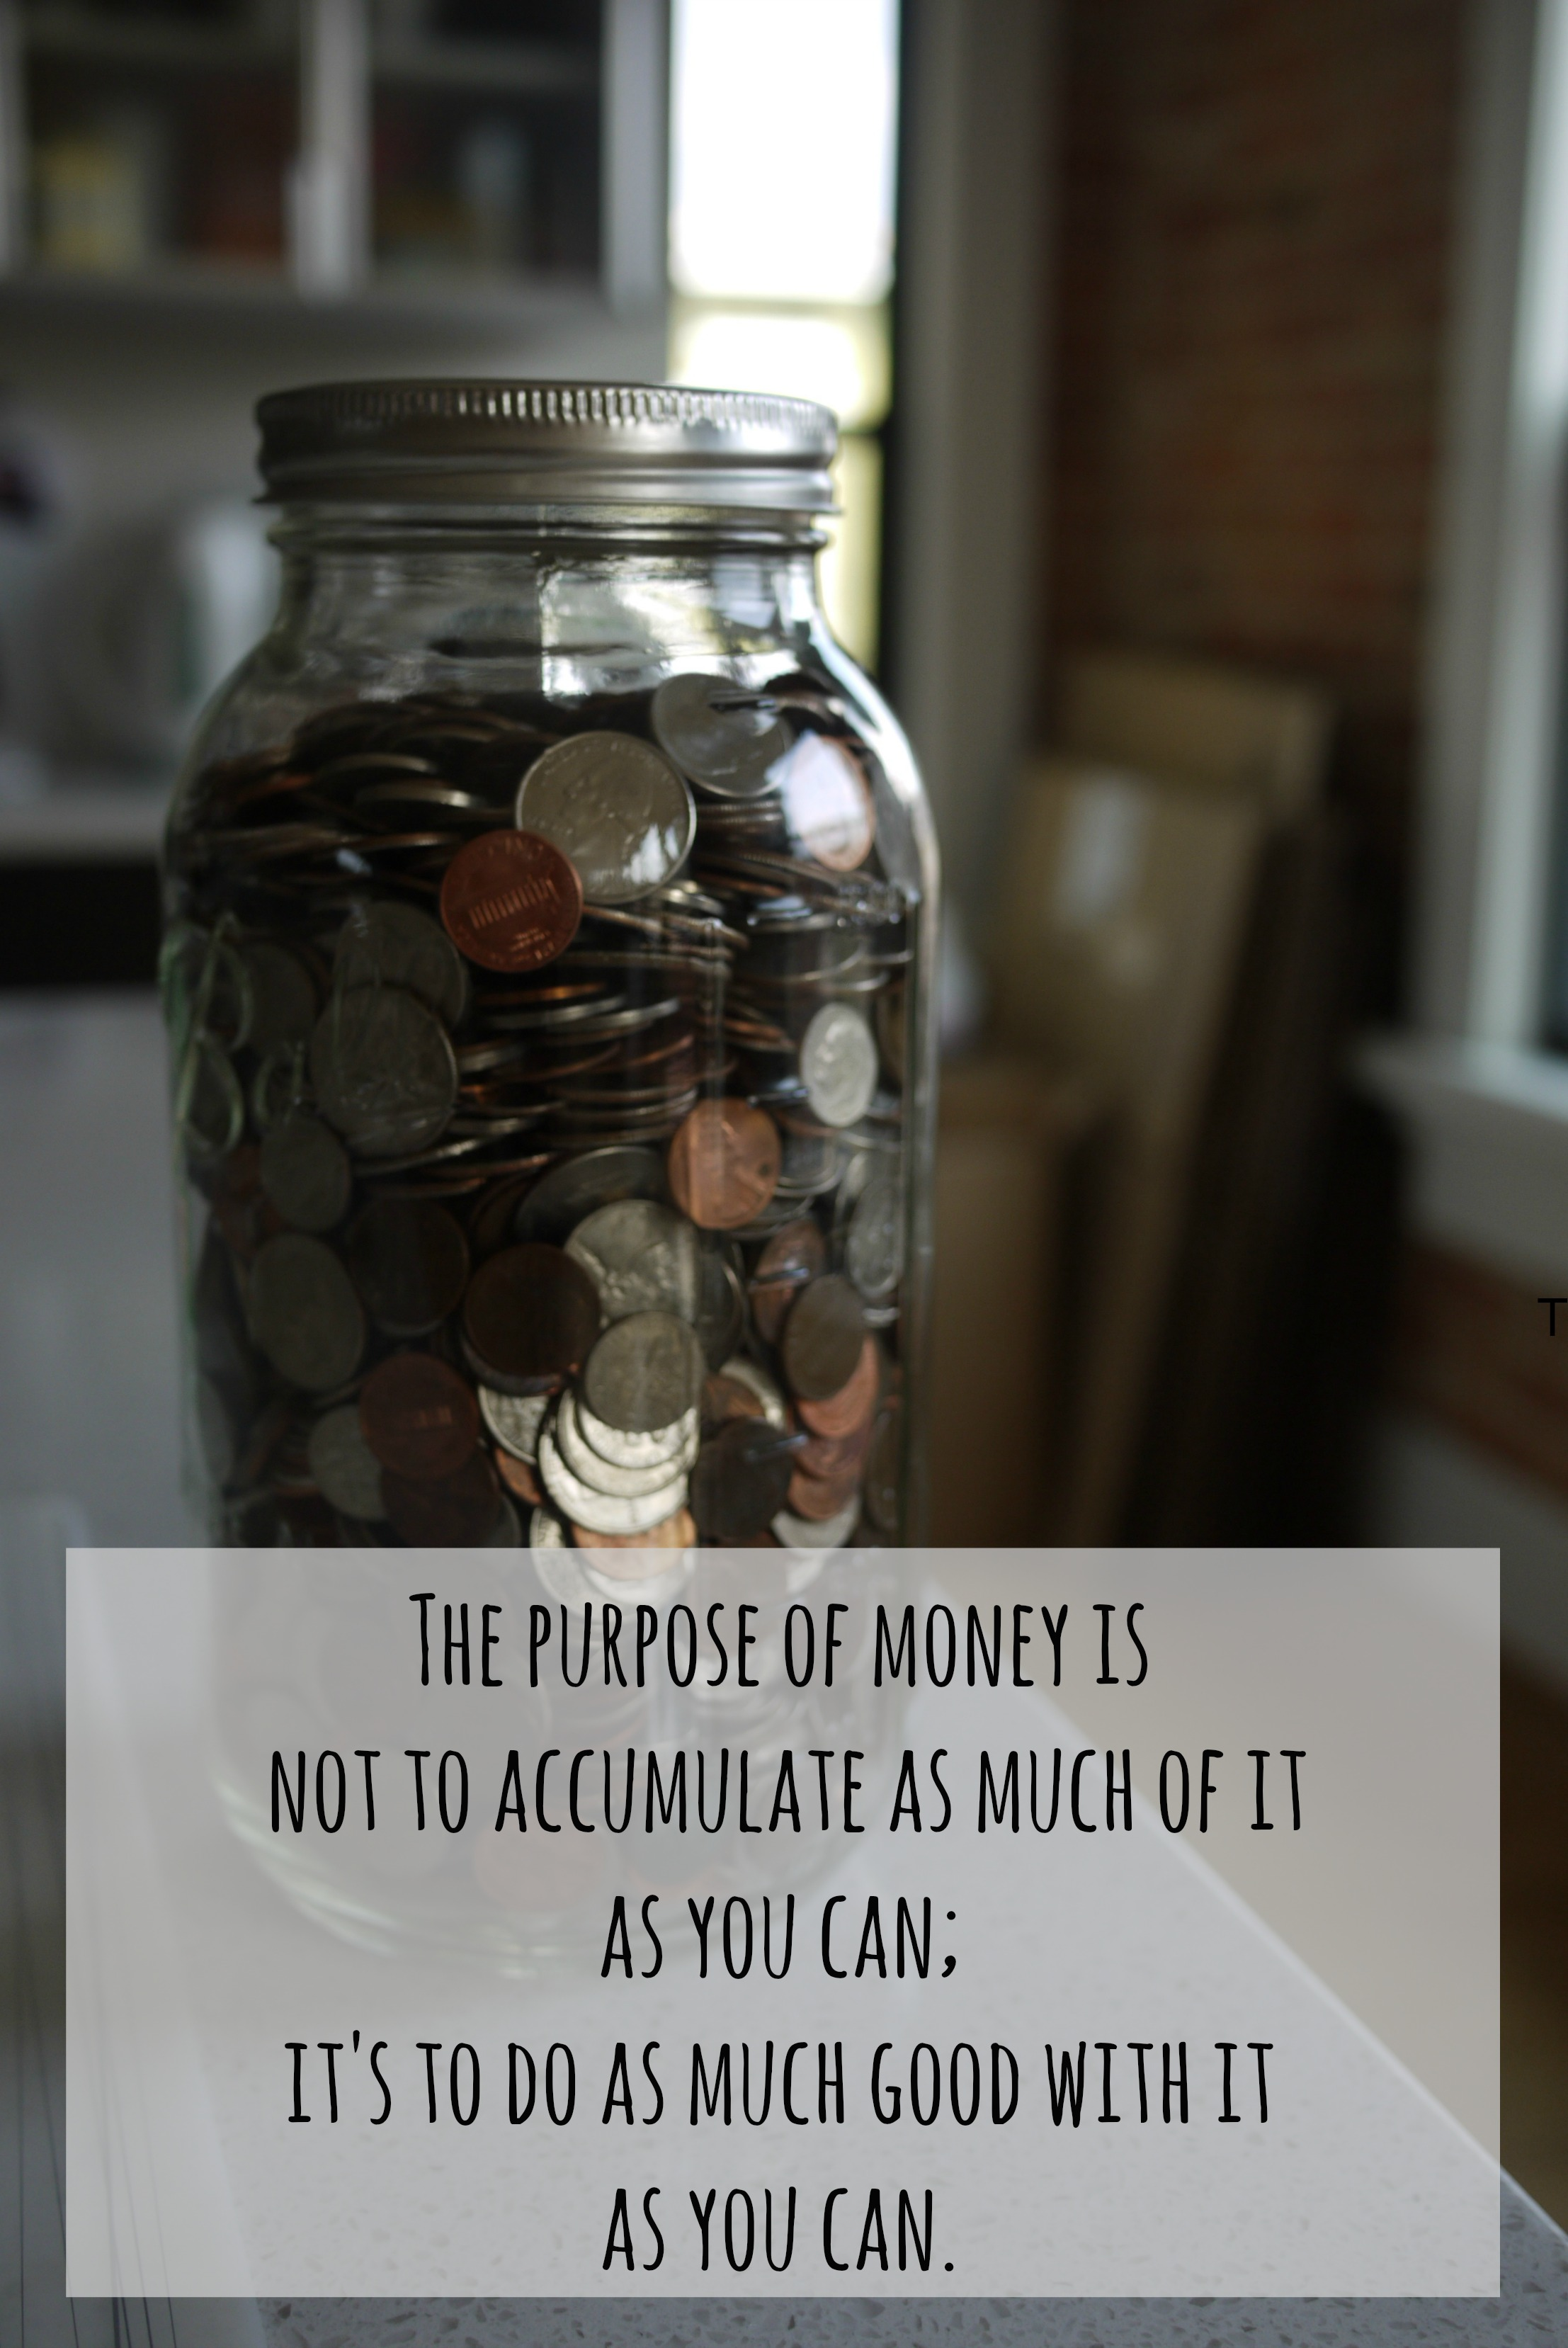 The purpose of money...